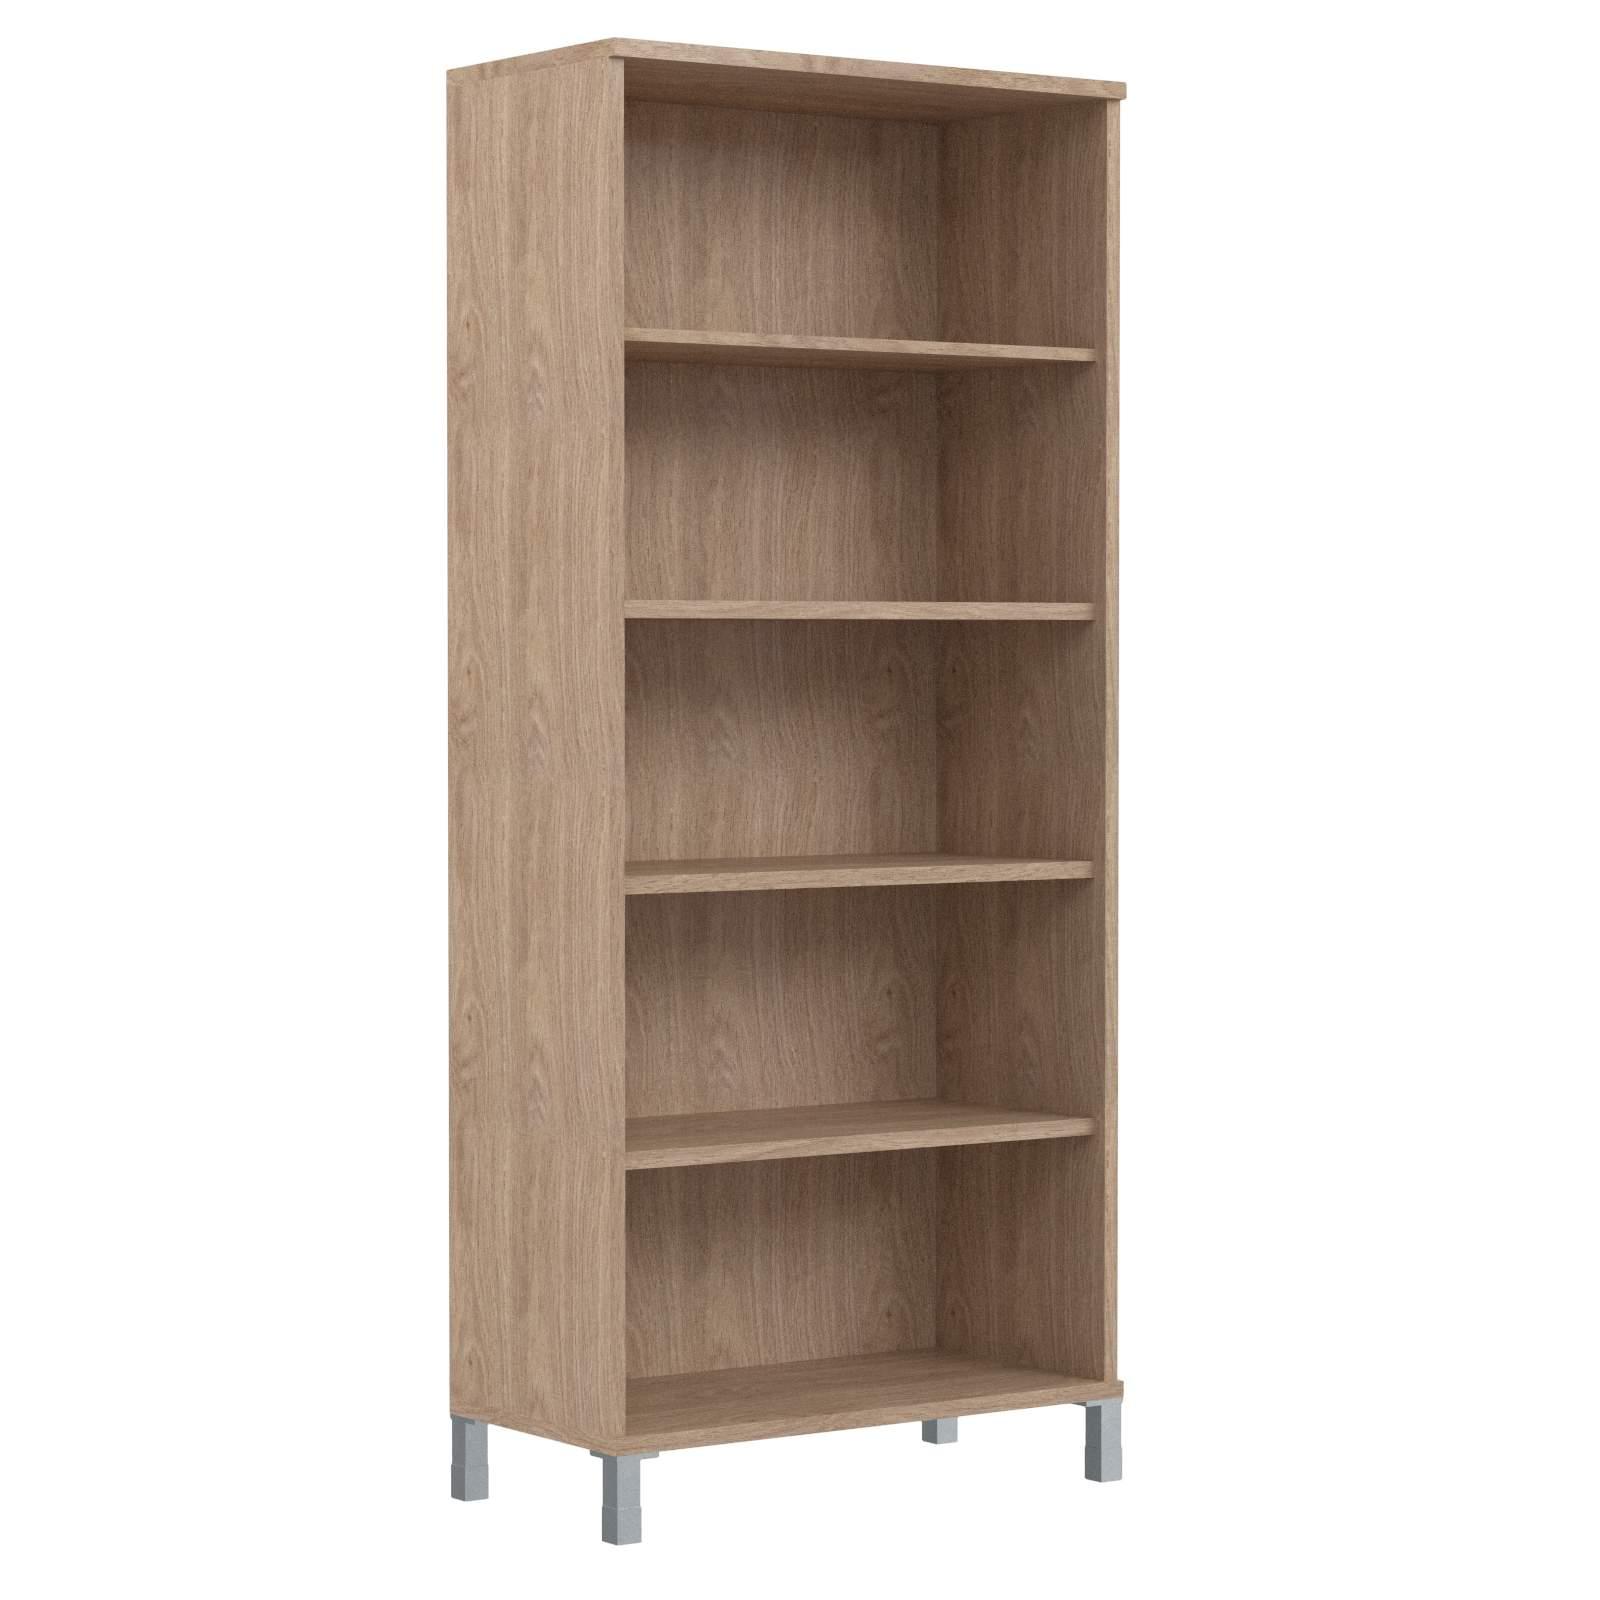 Каркас шкафа высокого 900х435х2004